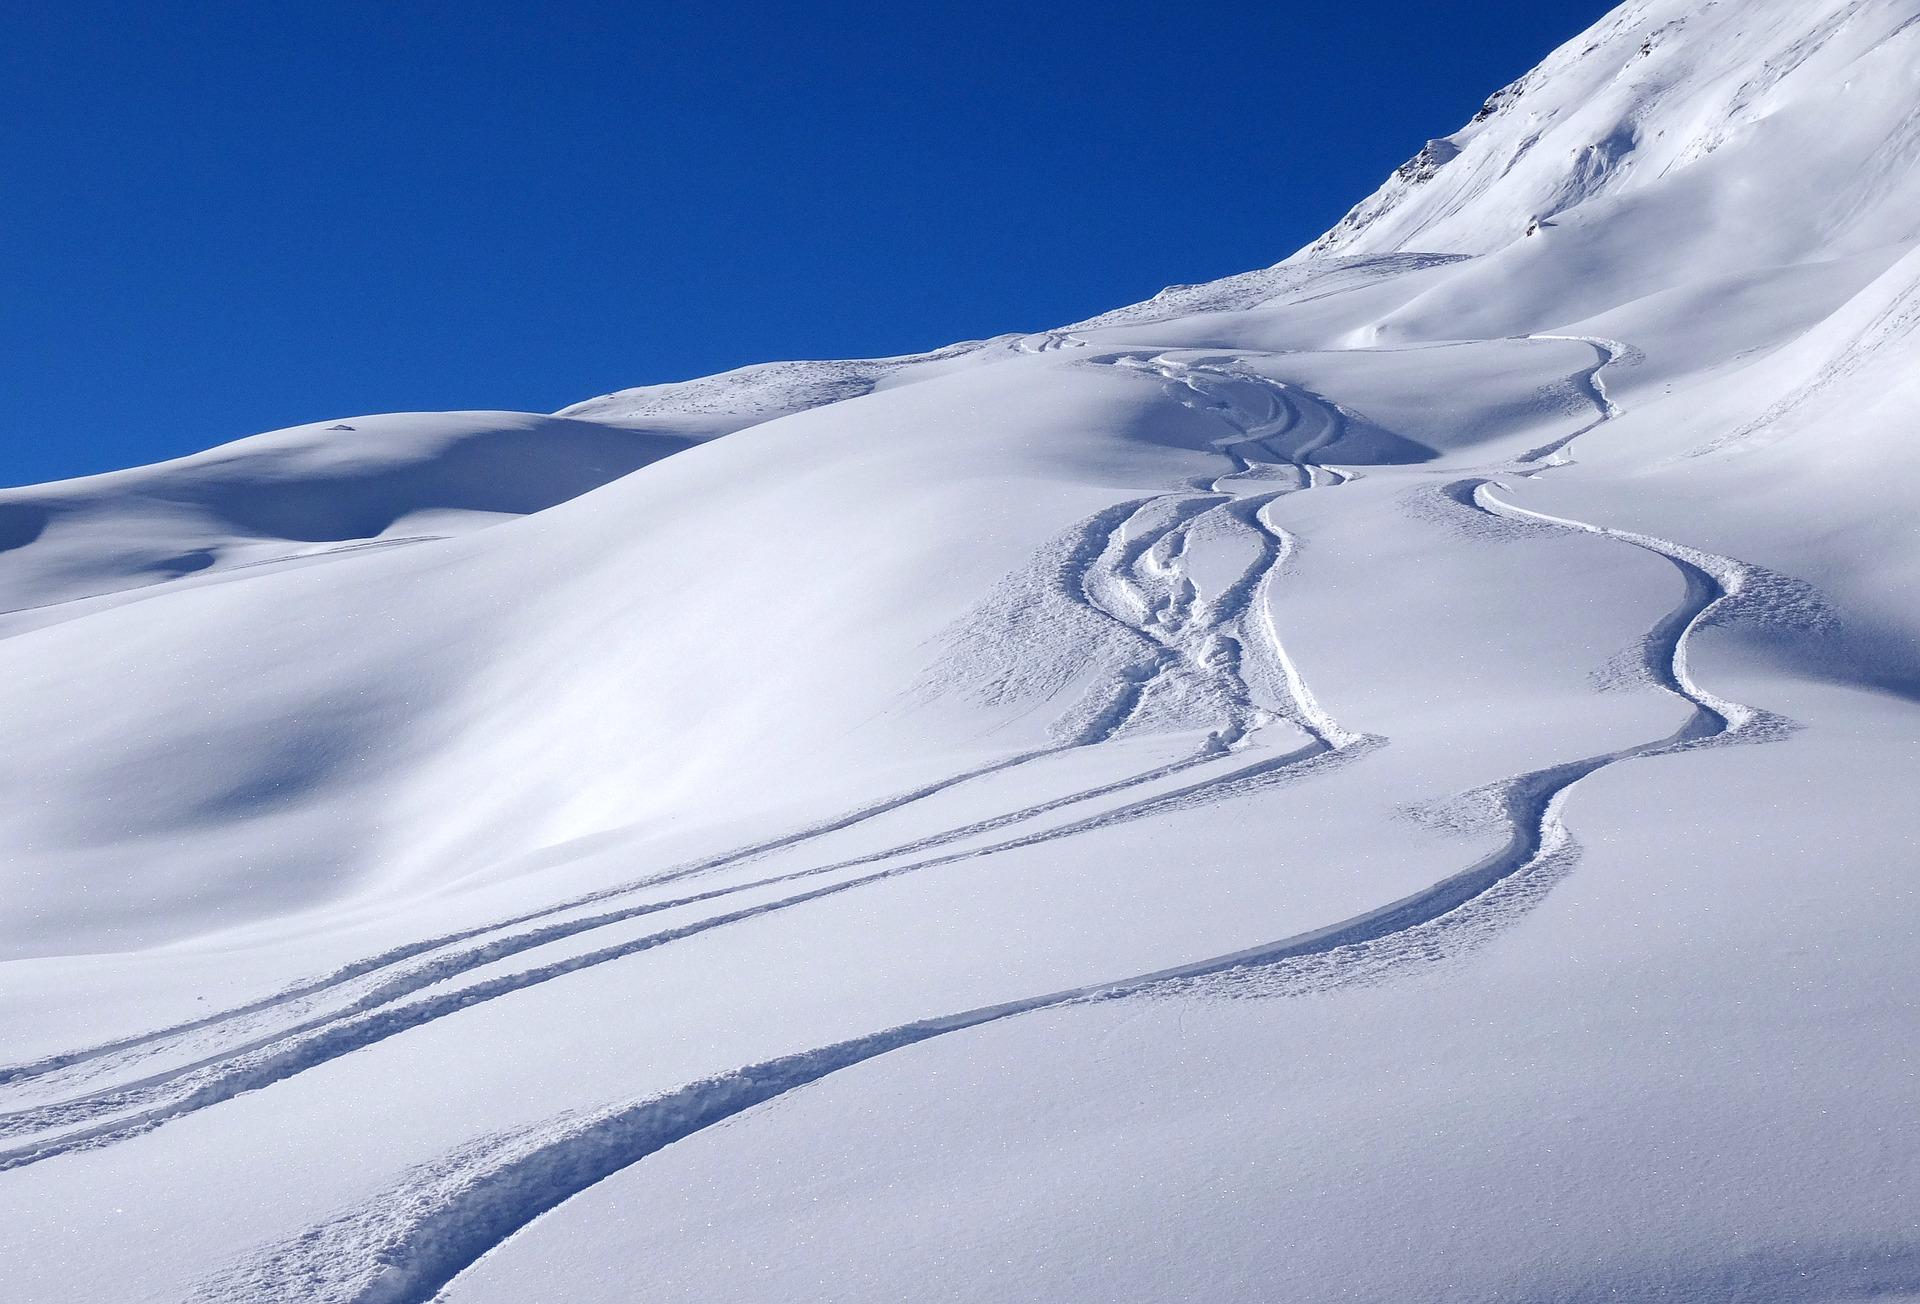 snow-1273379_1920